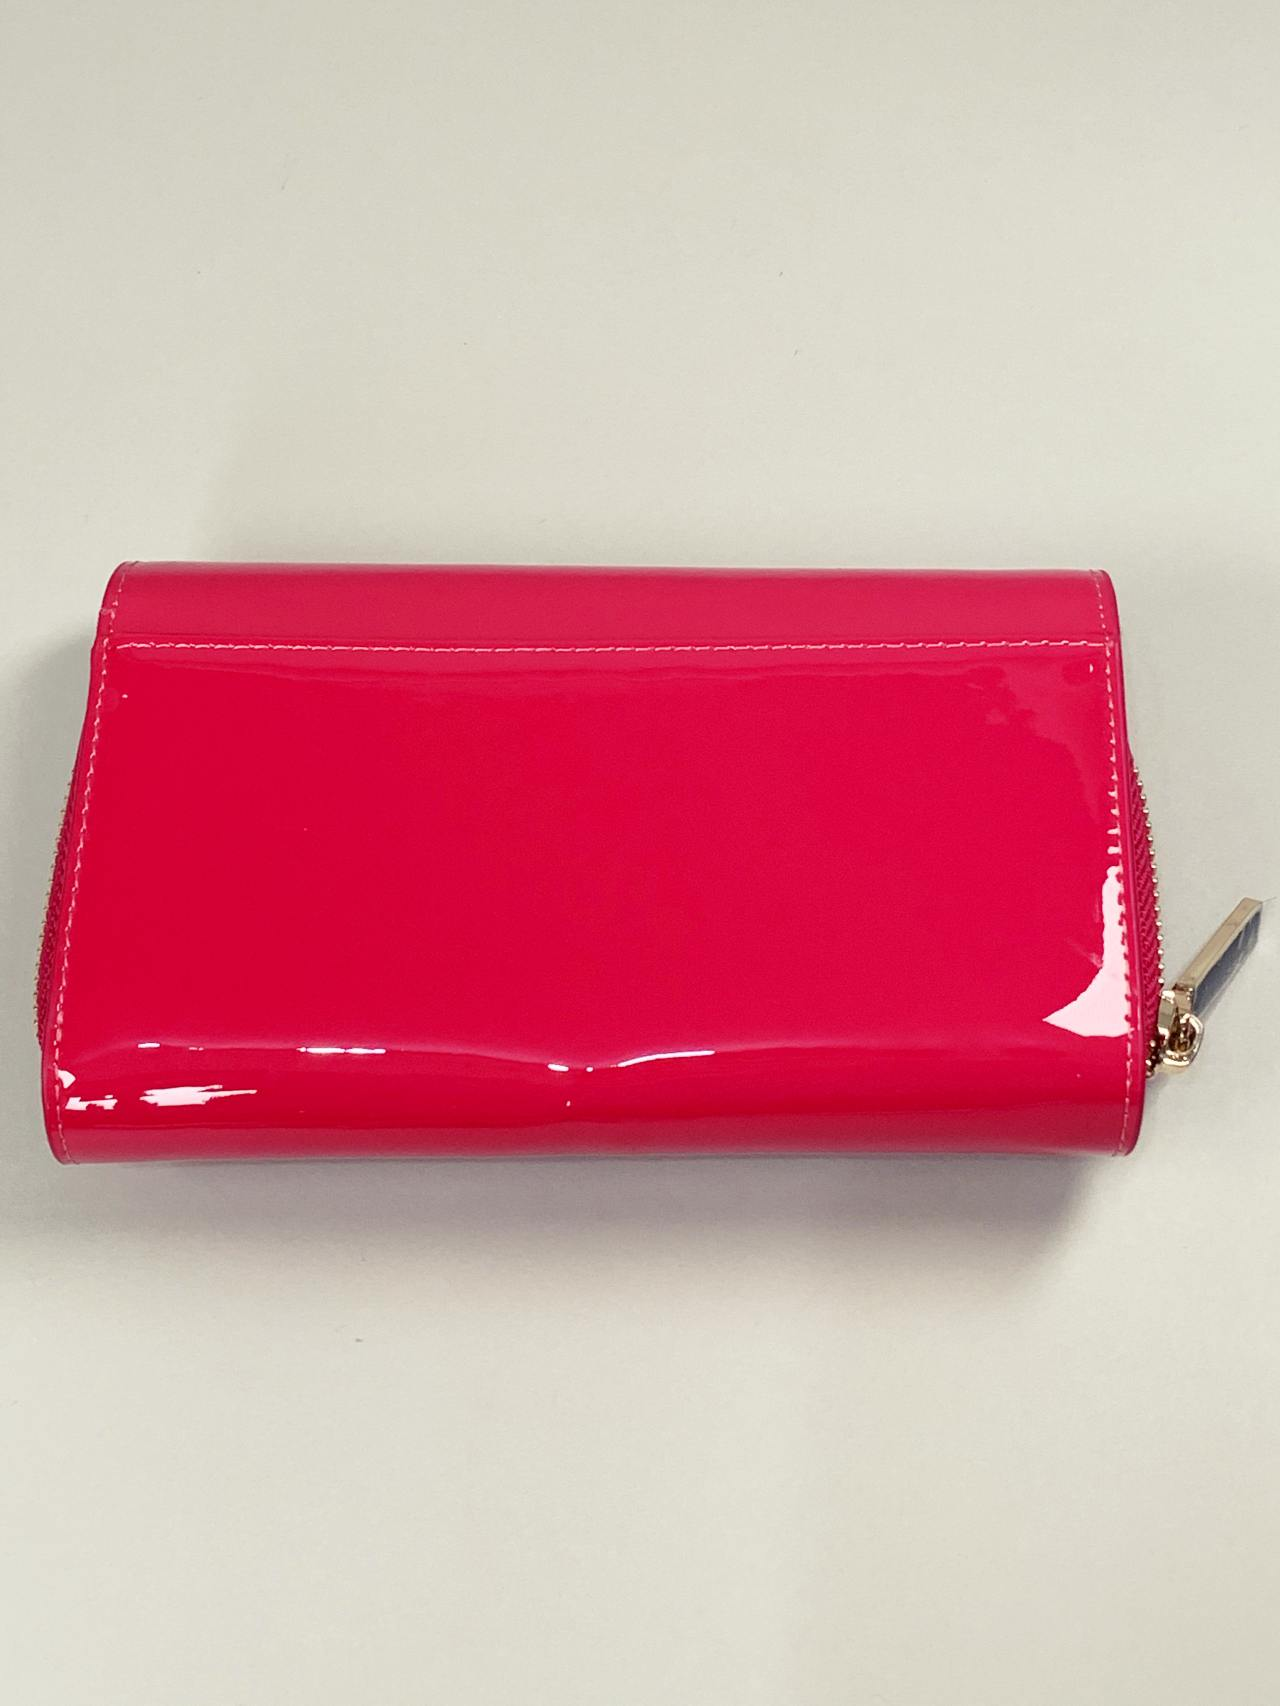 Kožená peněženka Monnari M2 růžová -07